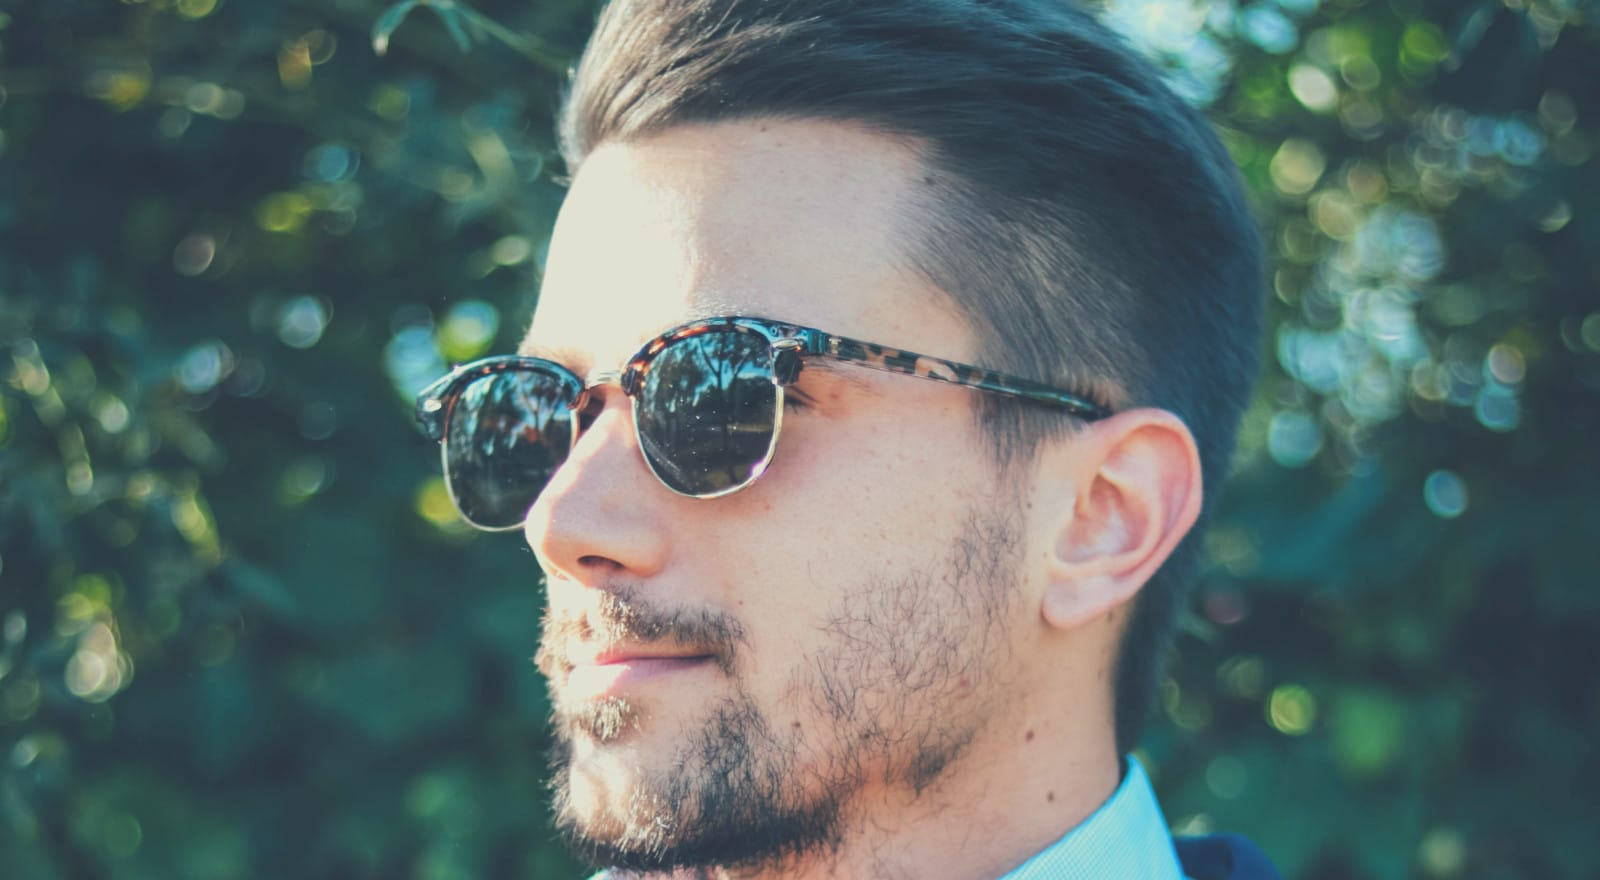 d5750471af3d 43 Best Sunglasses for Men that are Trending in 2019